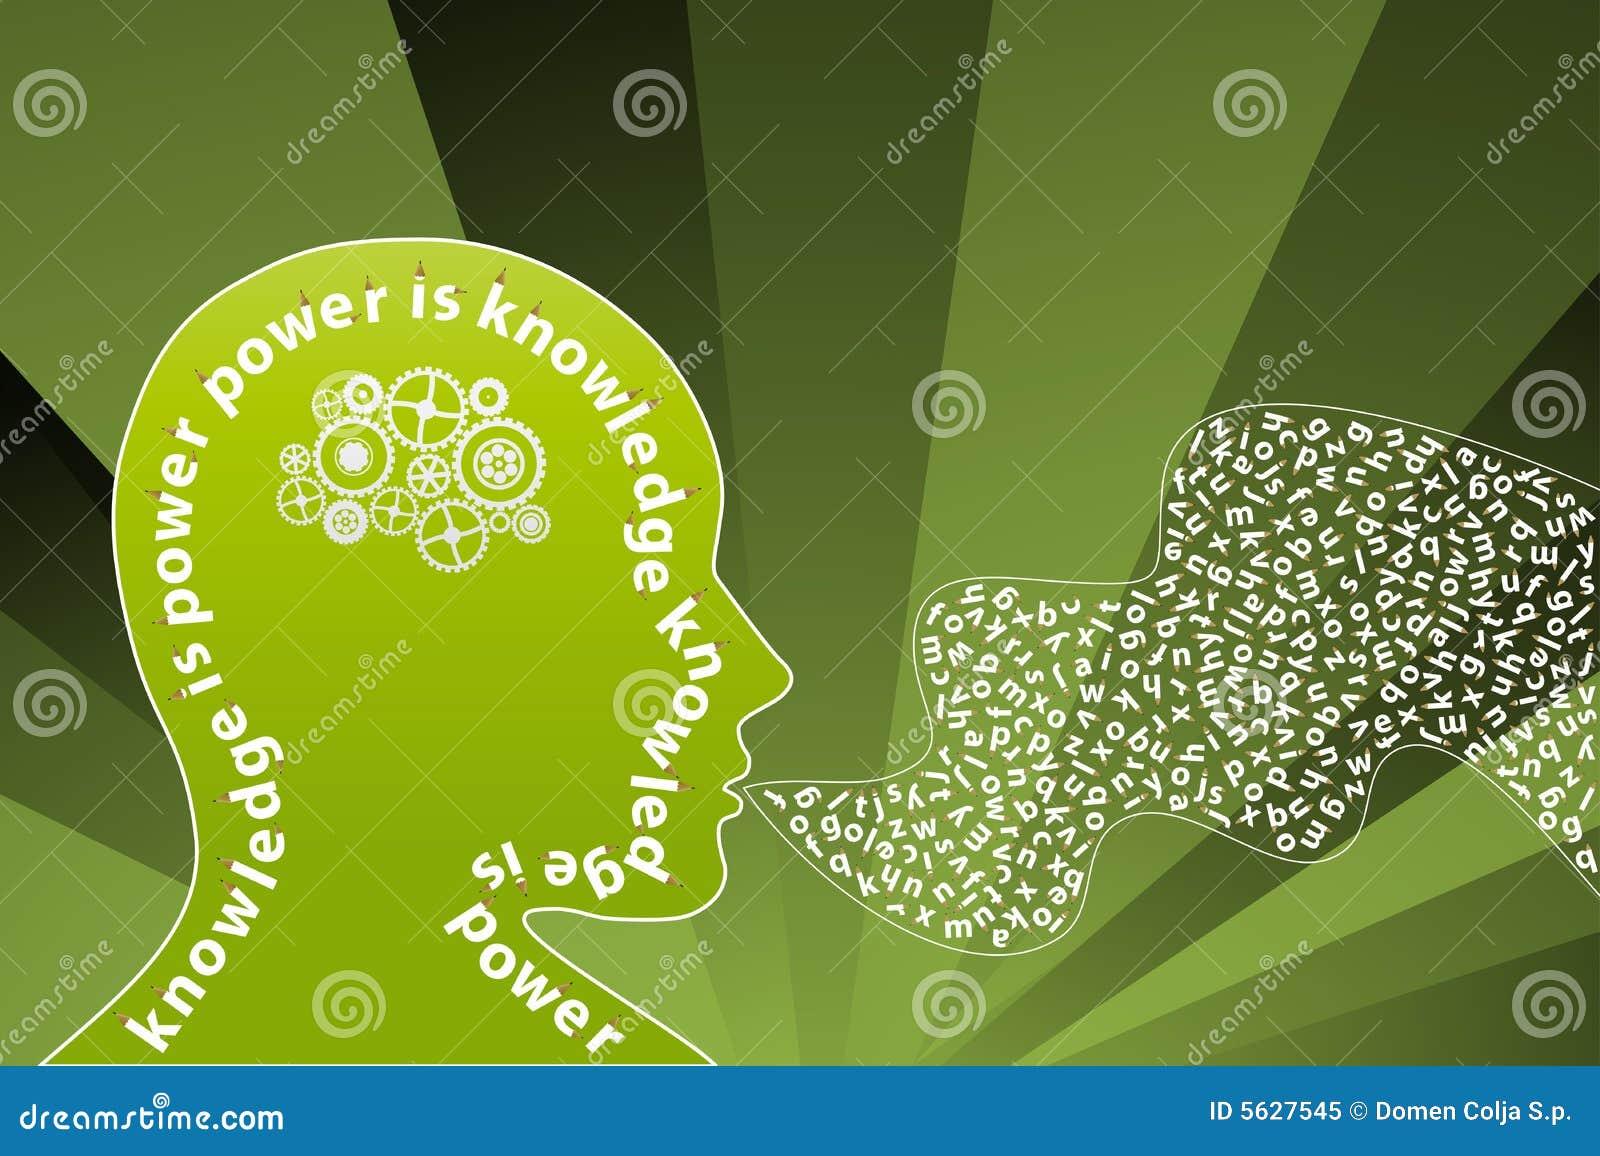 Knowledge creative mind speaker